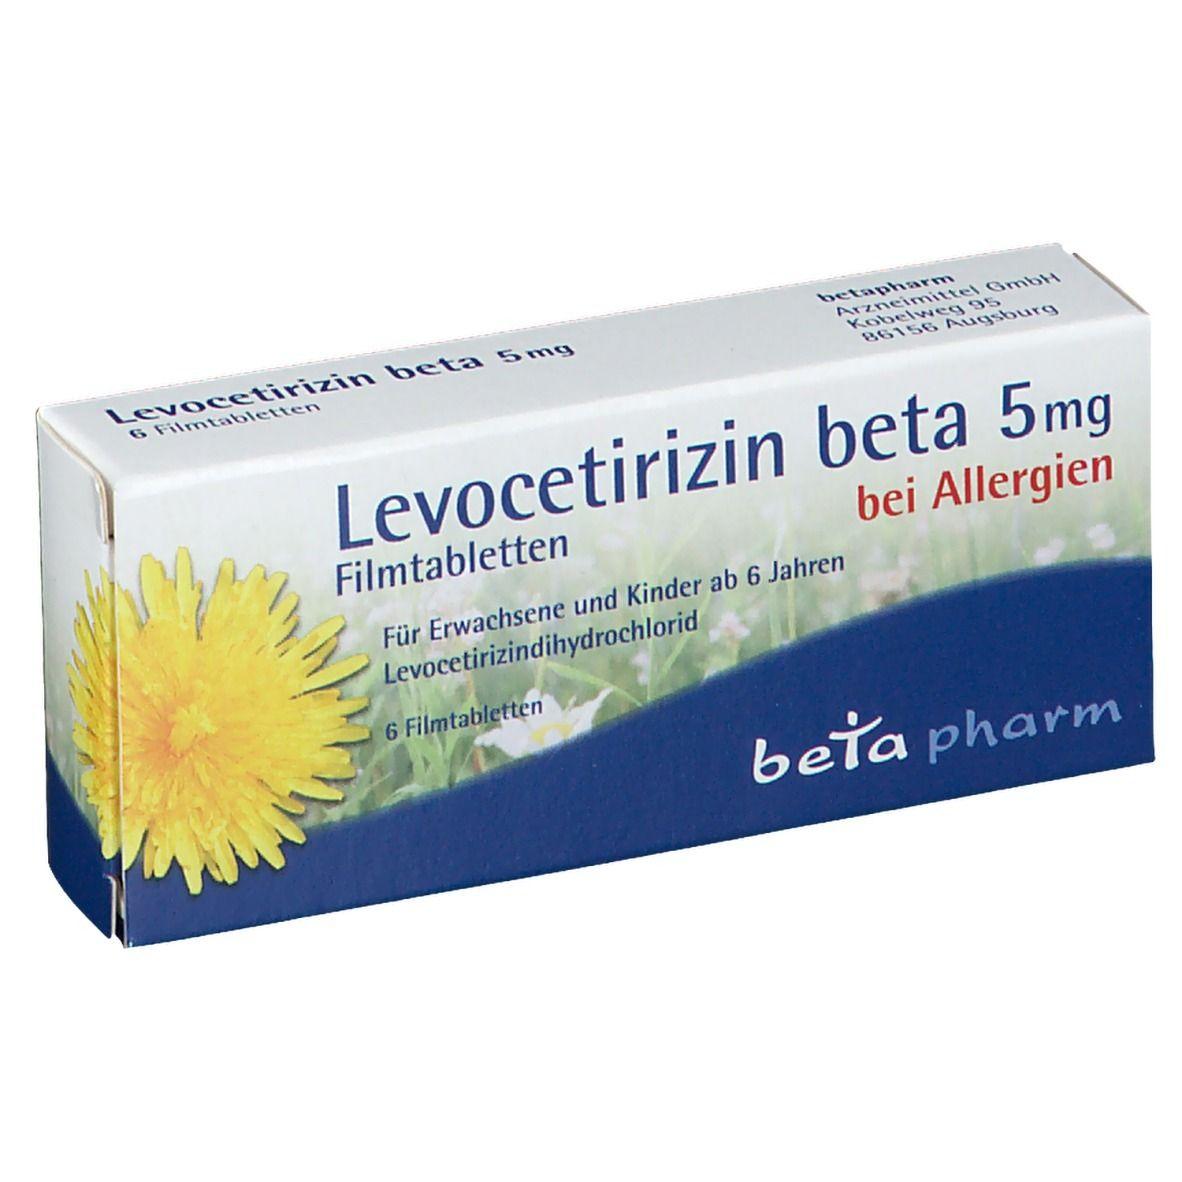 Erfahrungen levocetirizin Xyzal, Medikamentenberichte